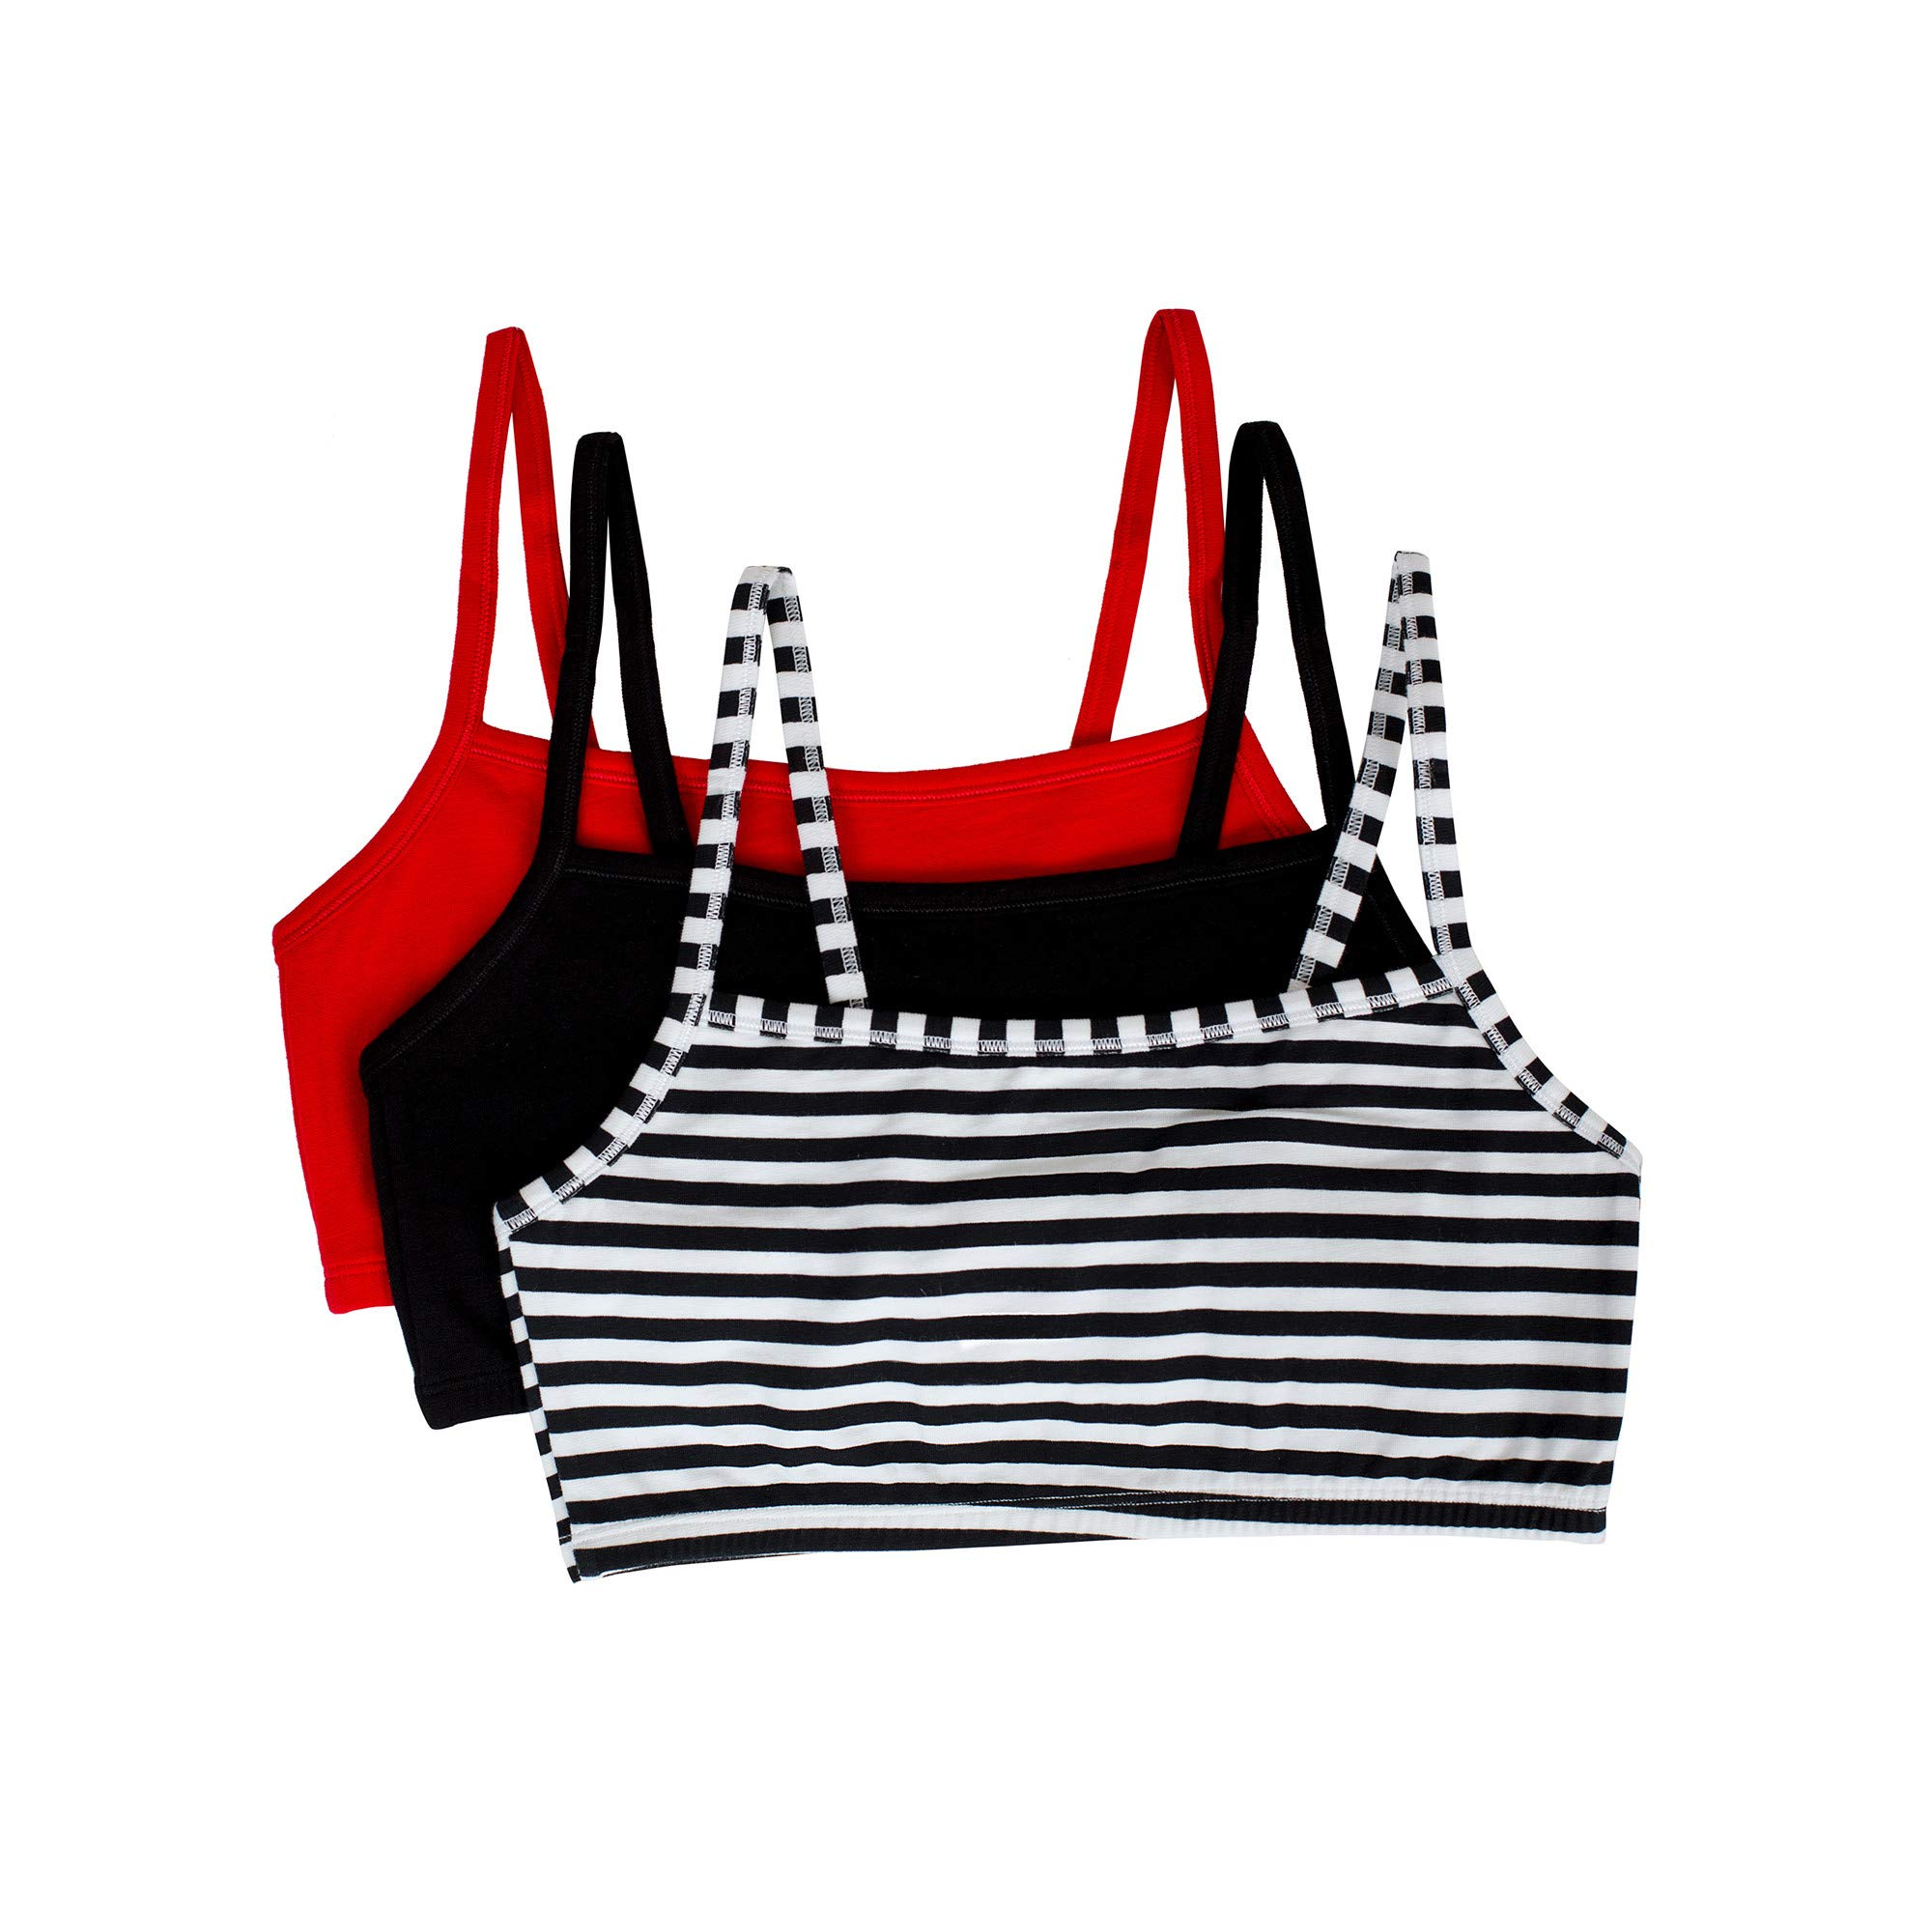 Fruit of the Loom Women's Cotton Pullover Sport Bra (Pack of 3) Bra, Skinny Stripe/Black/red hot, 32